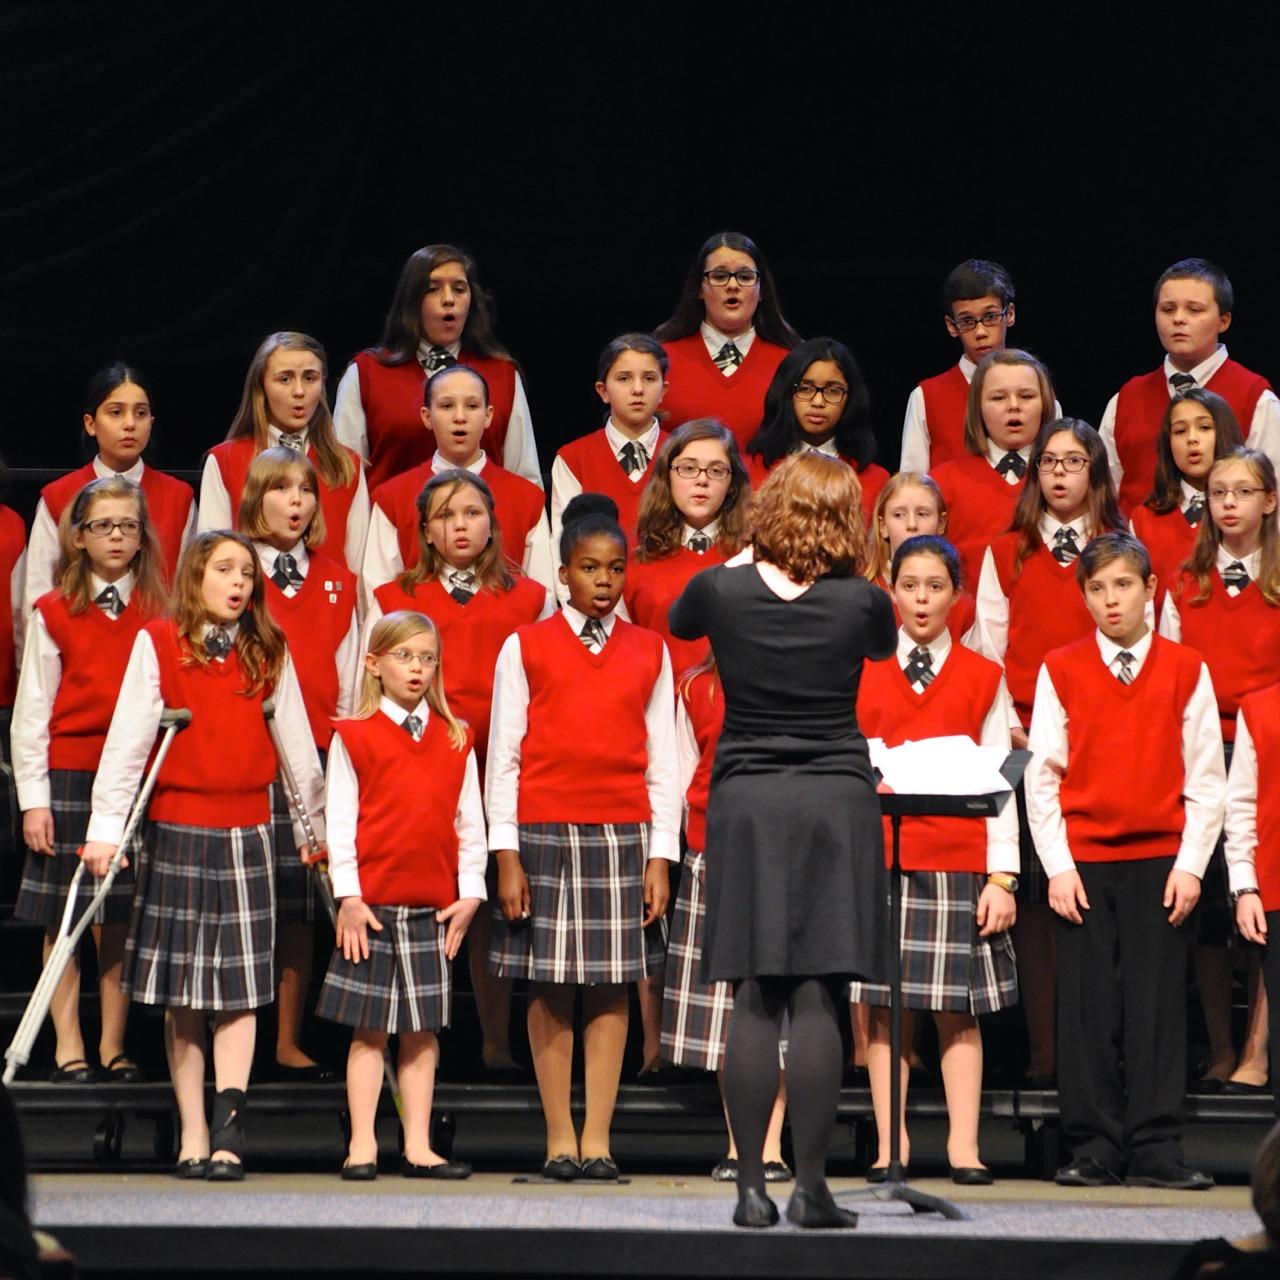 national childrens choir performance - HD1280×1280